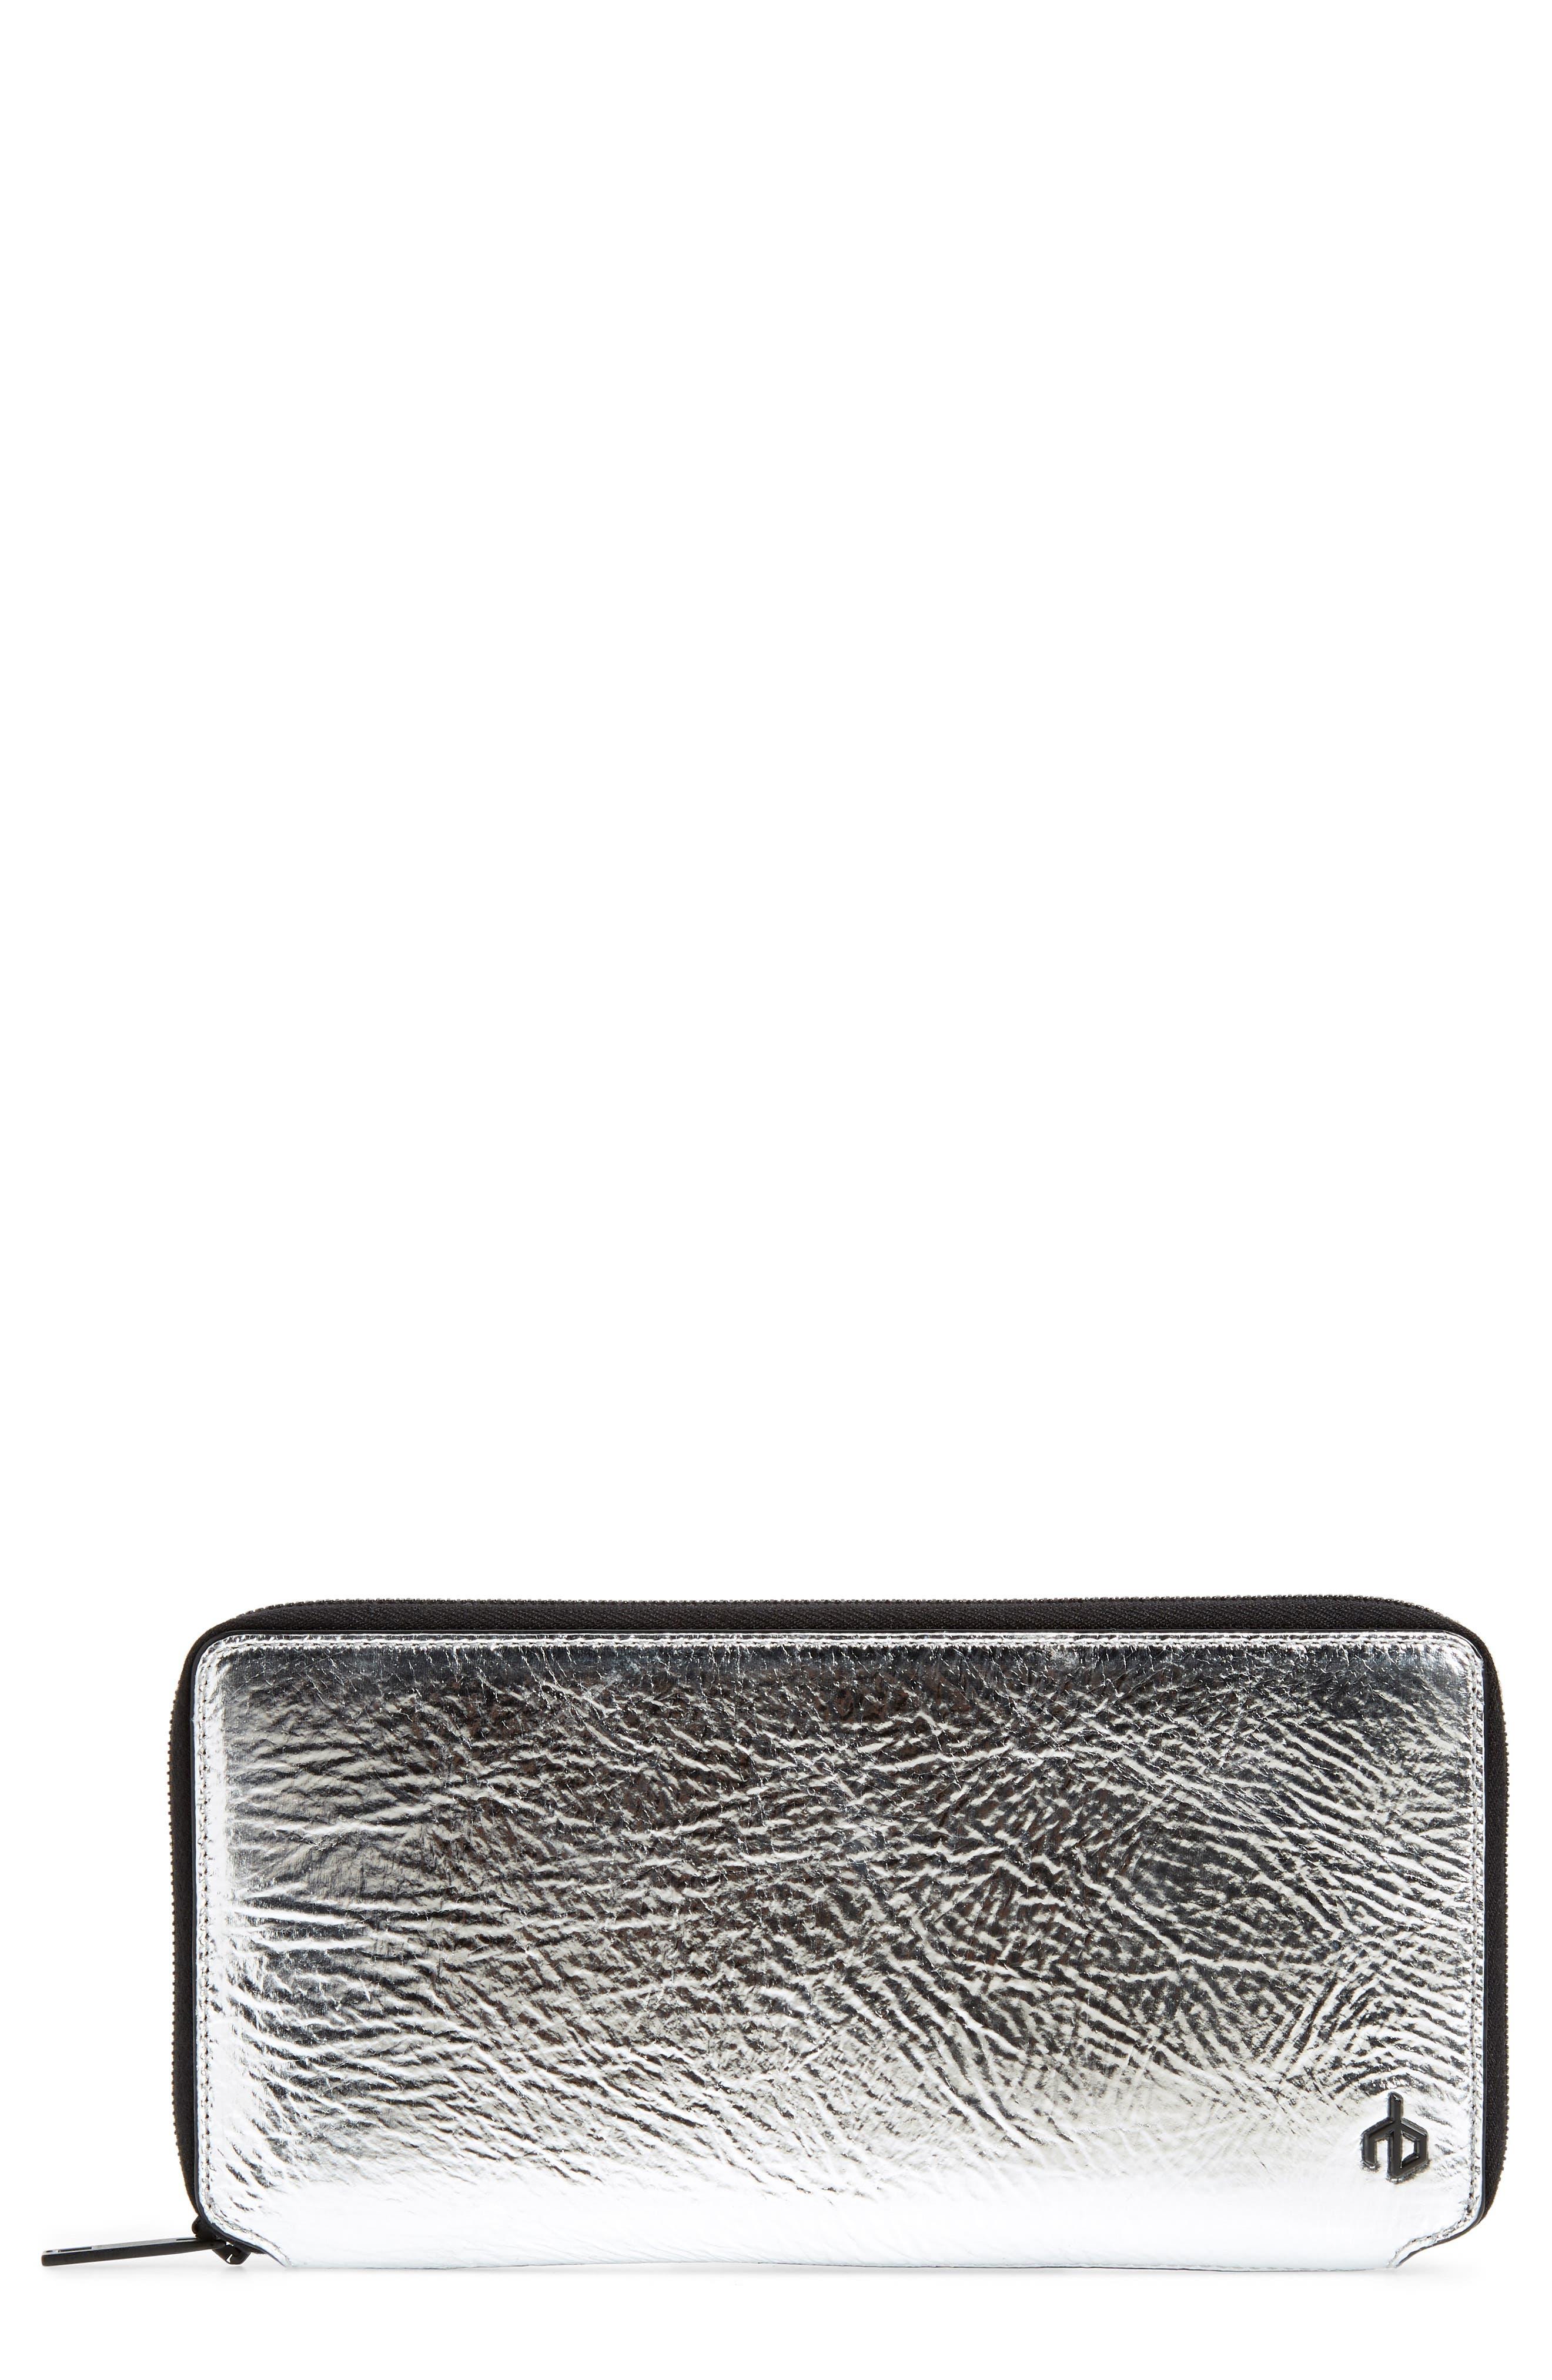 Croc Metallic Lambskin Leather Wallet,                         Main,                         color,